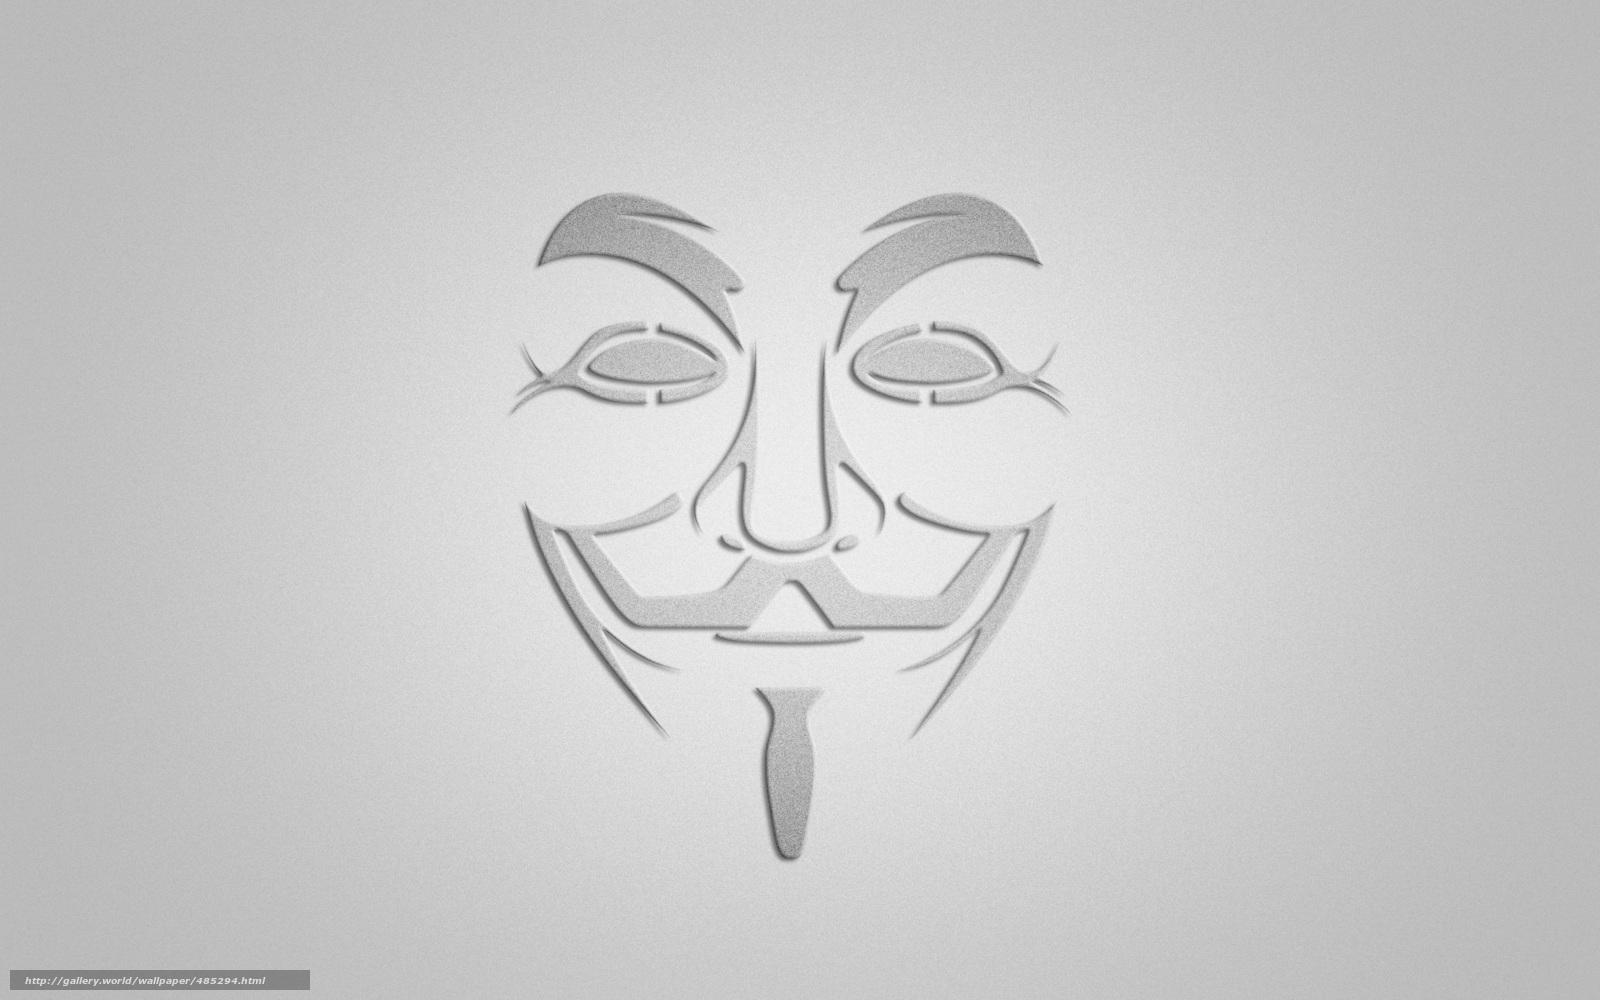 Download wallpap...V For Vendetta Mask Wallpaper